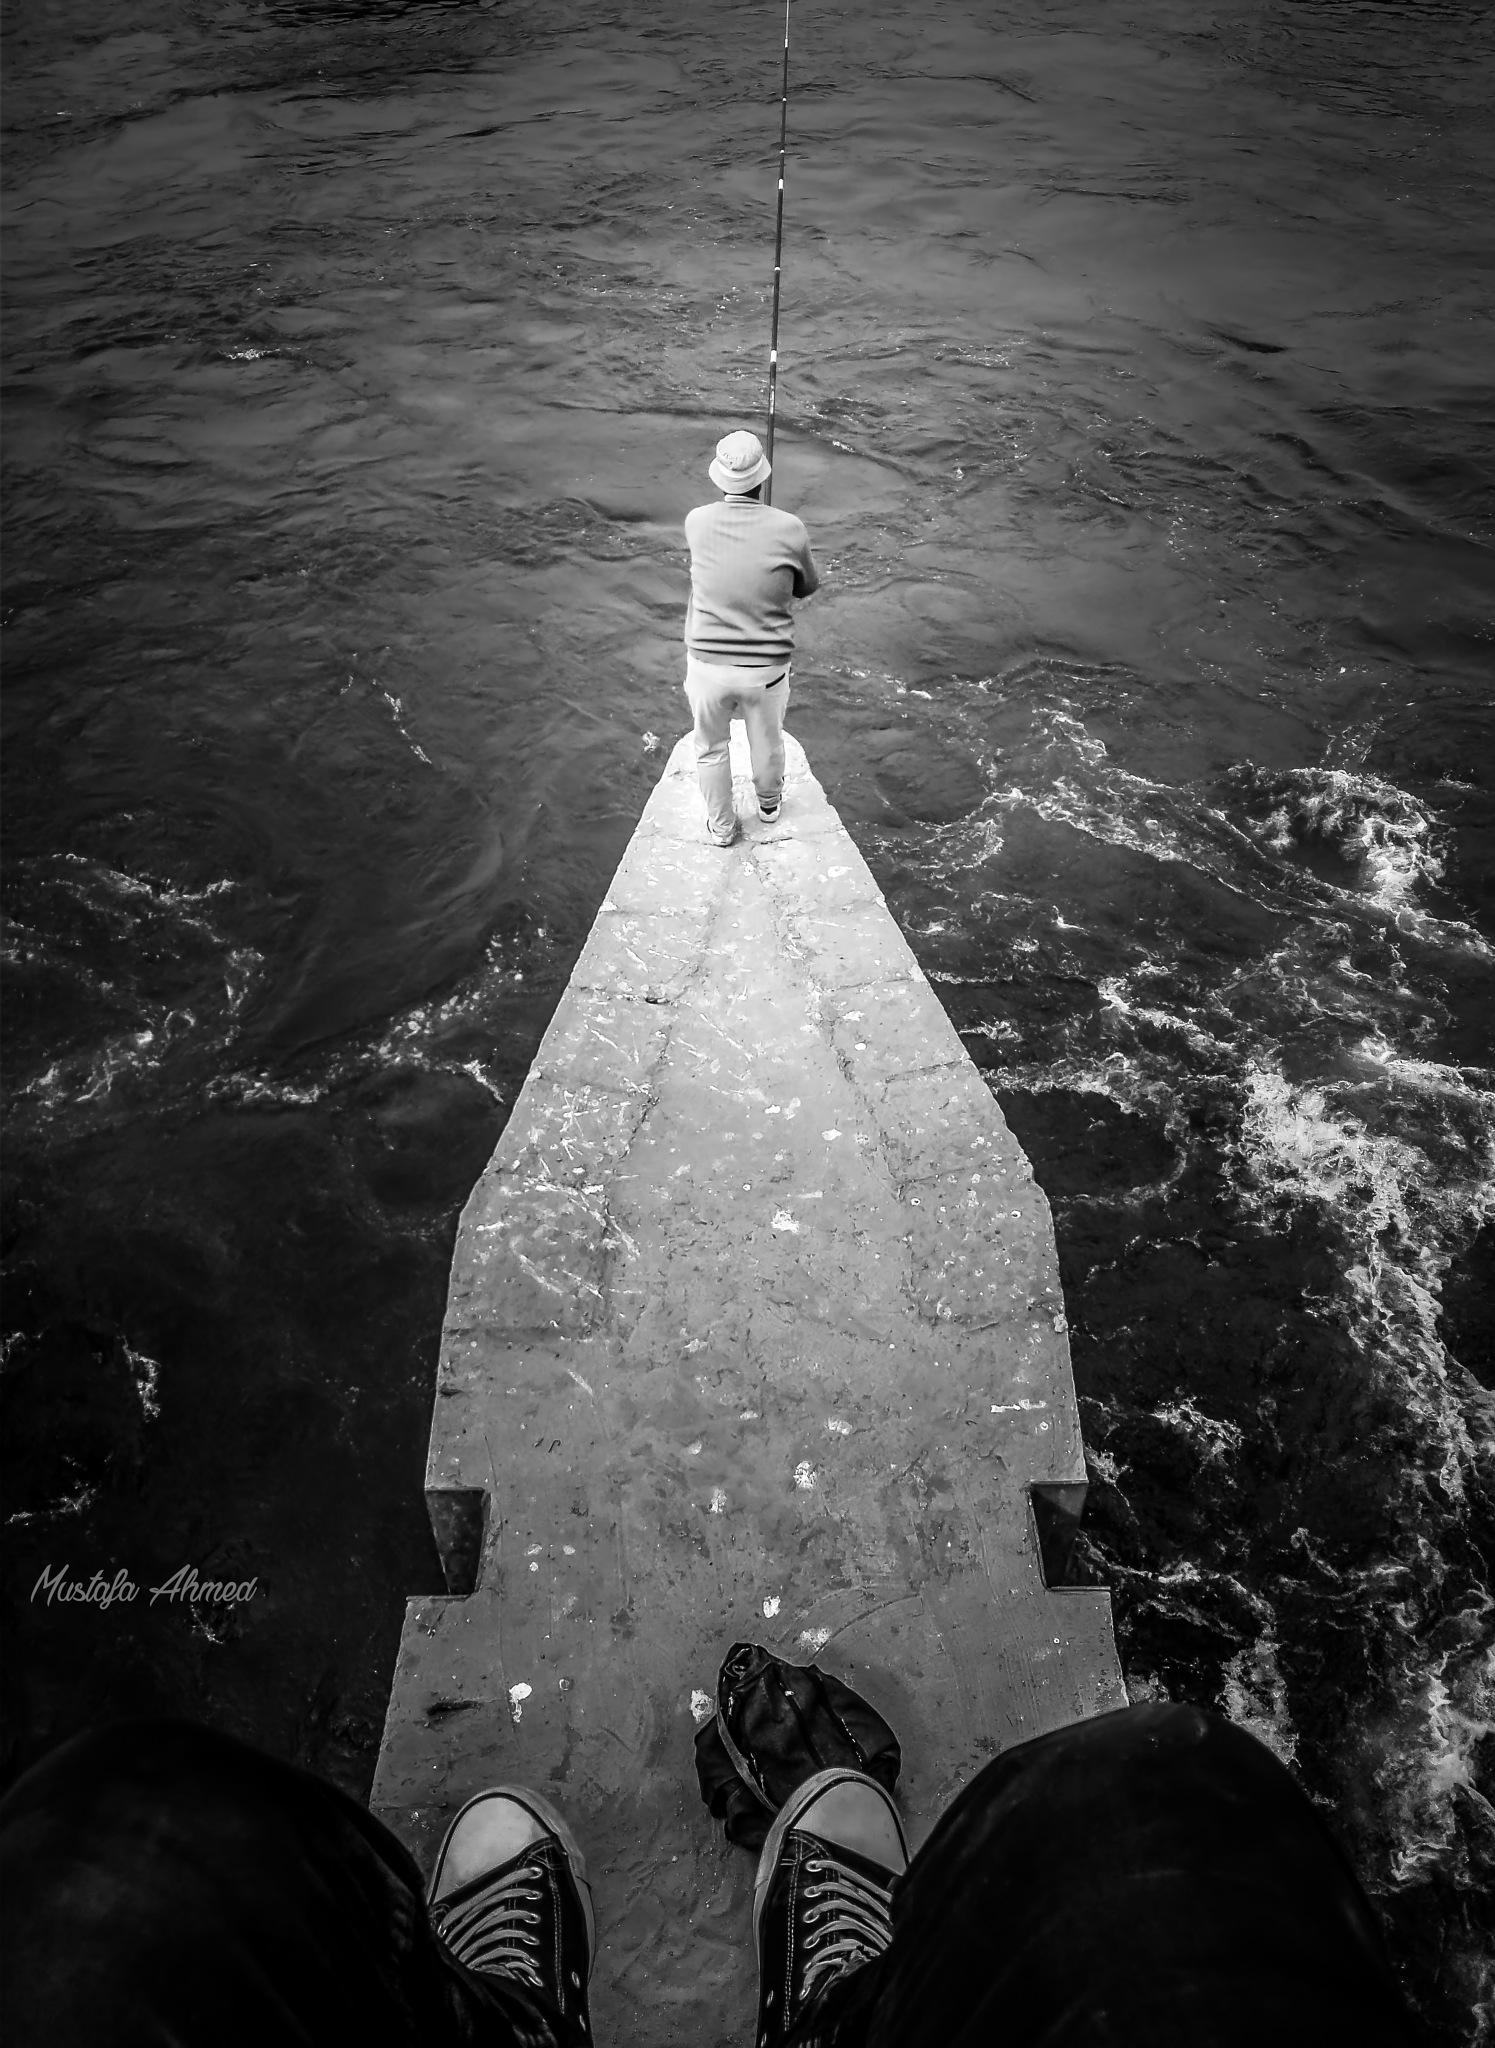 Untitled by Mustafa Ahmed